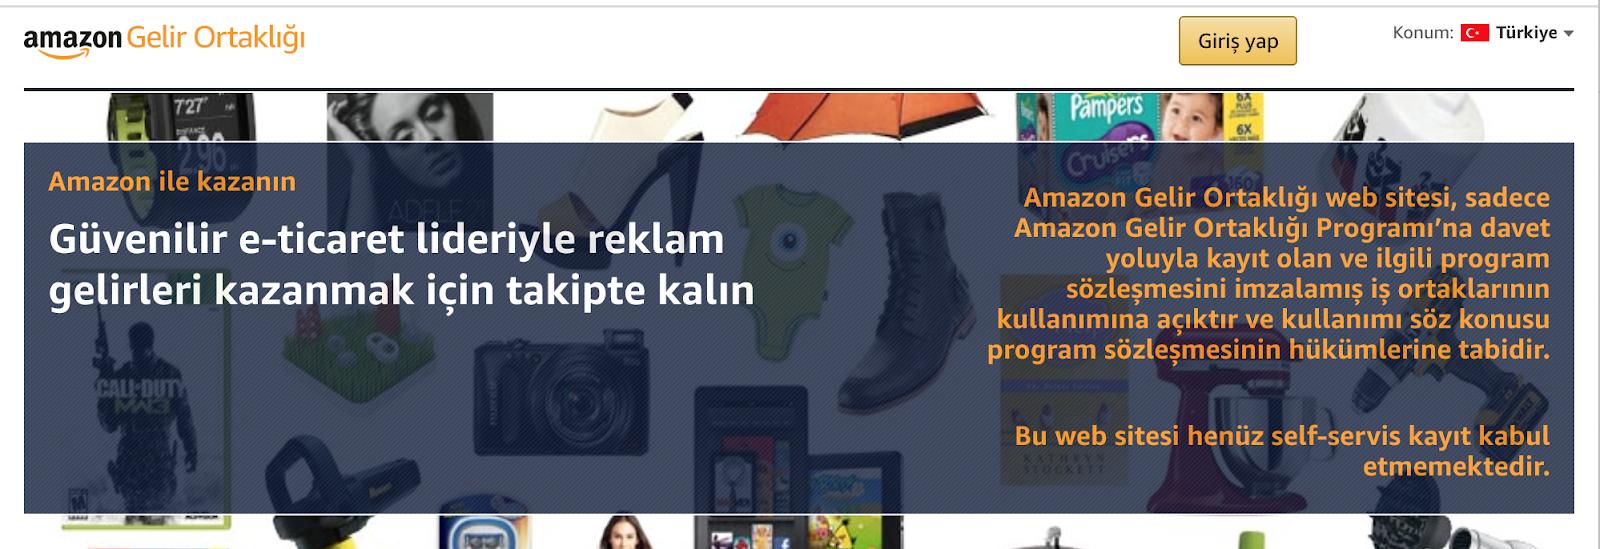 Image of website explaining the website does not yet accept self-service registration